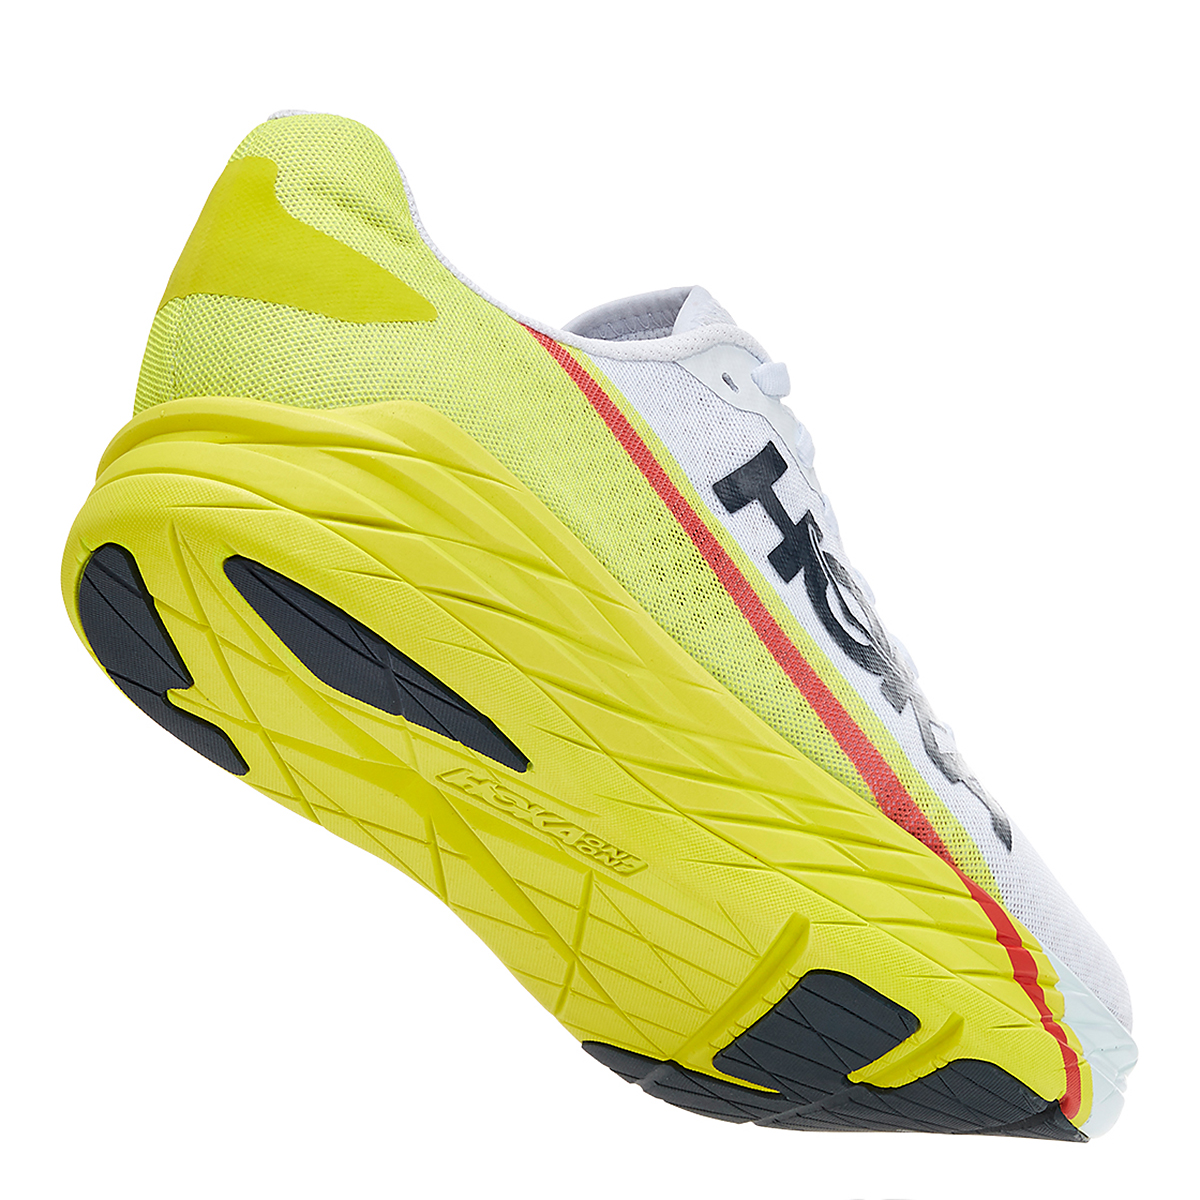 Men's Hoka One One Rocket X Running Shoe - Color: White/Evening Primrose - Size: 8.5 - Width: Regular, White/Evening Primrose, large, image 4